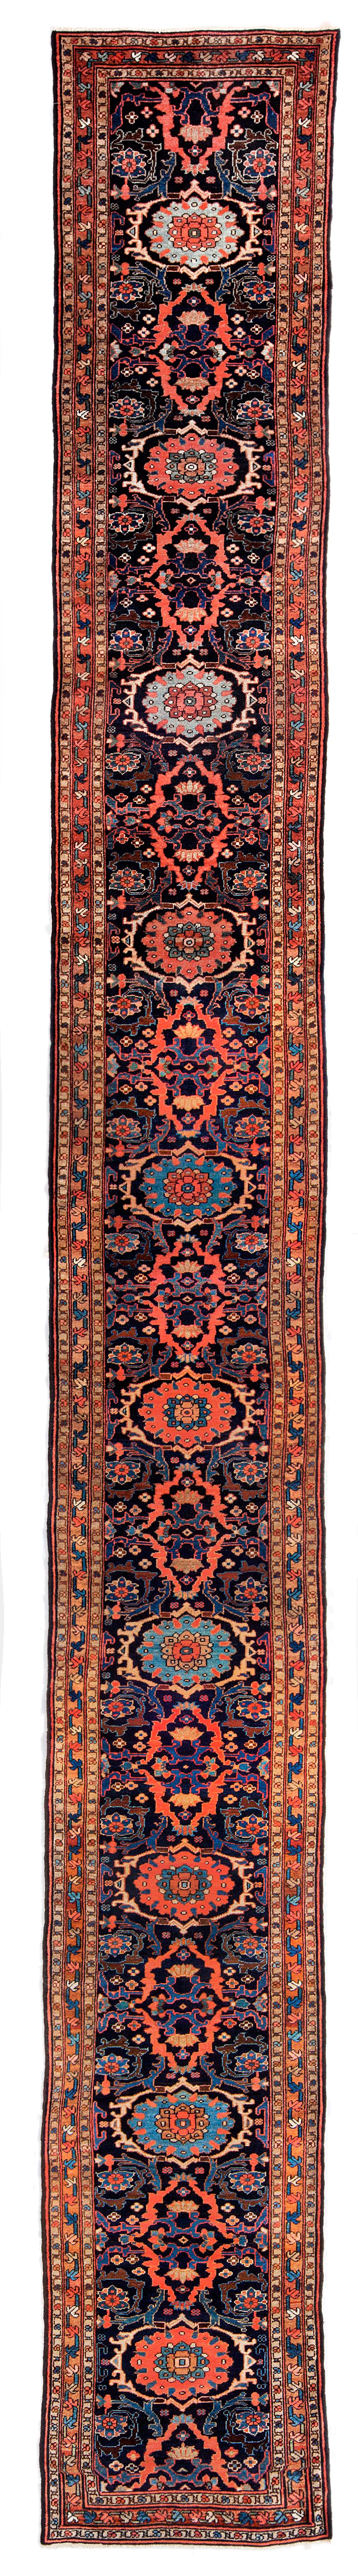 Northwest Persian Runner_17380